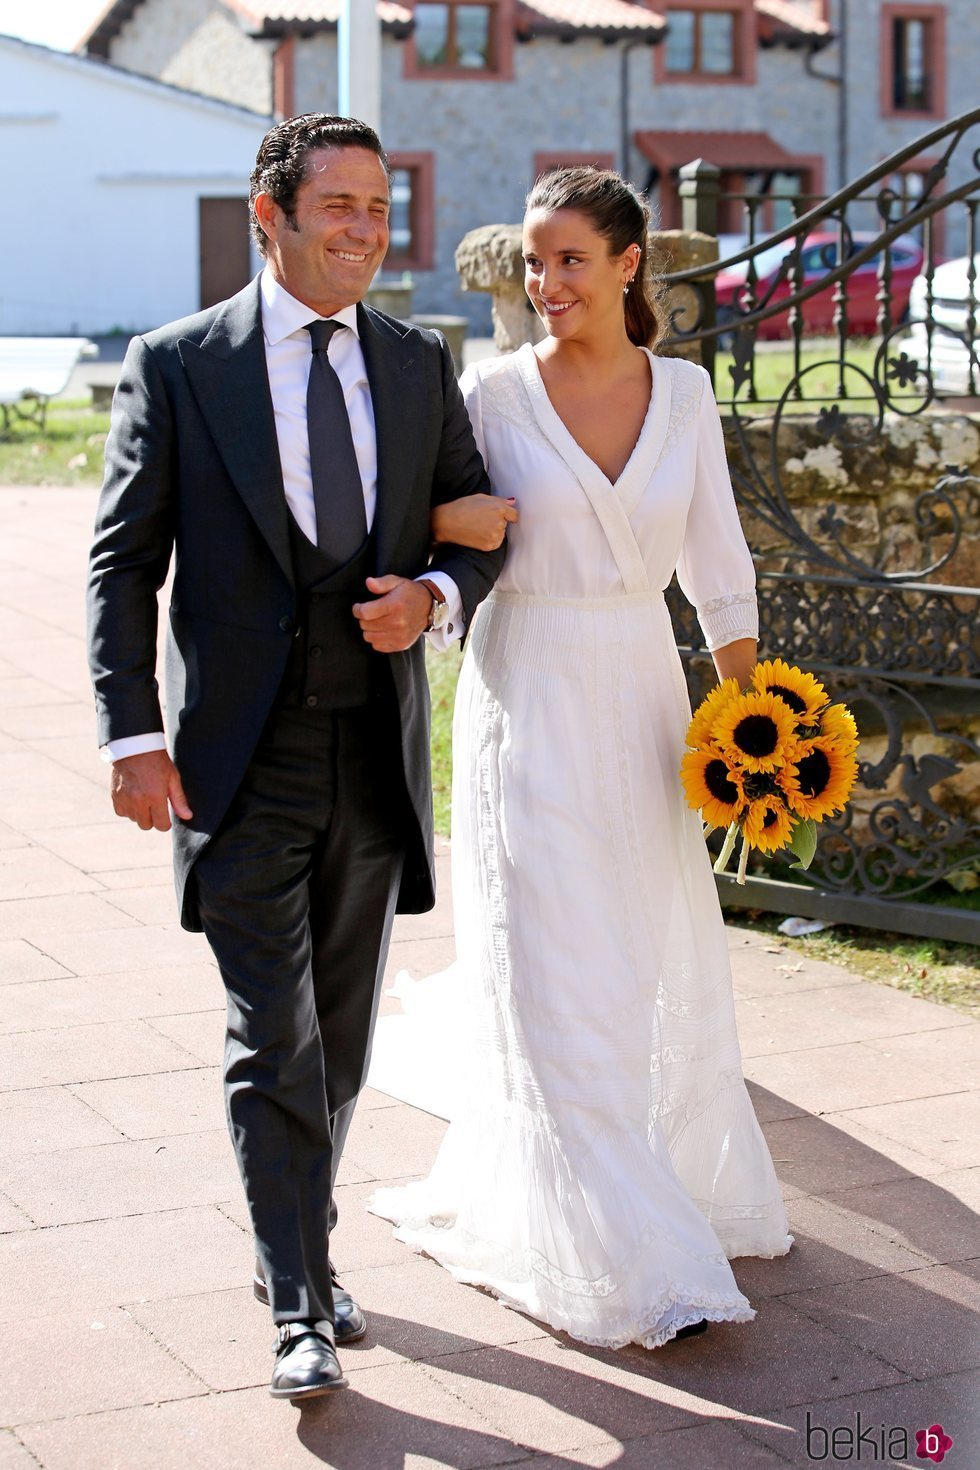 Marta Pombo llegando a su boda con Luis Giménez